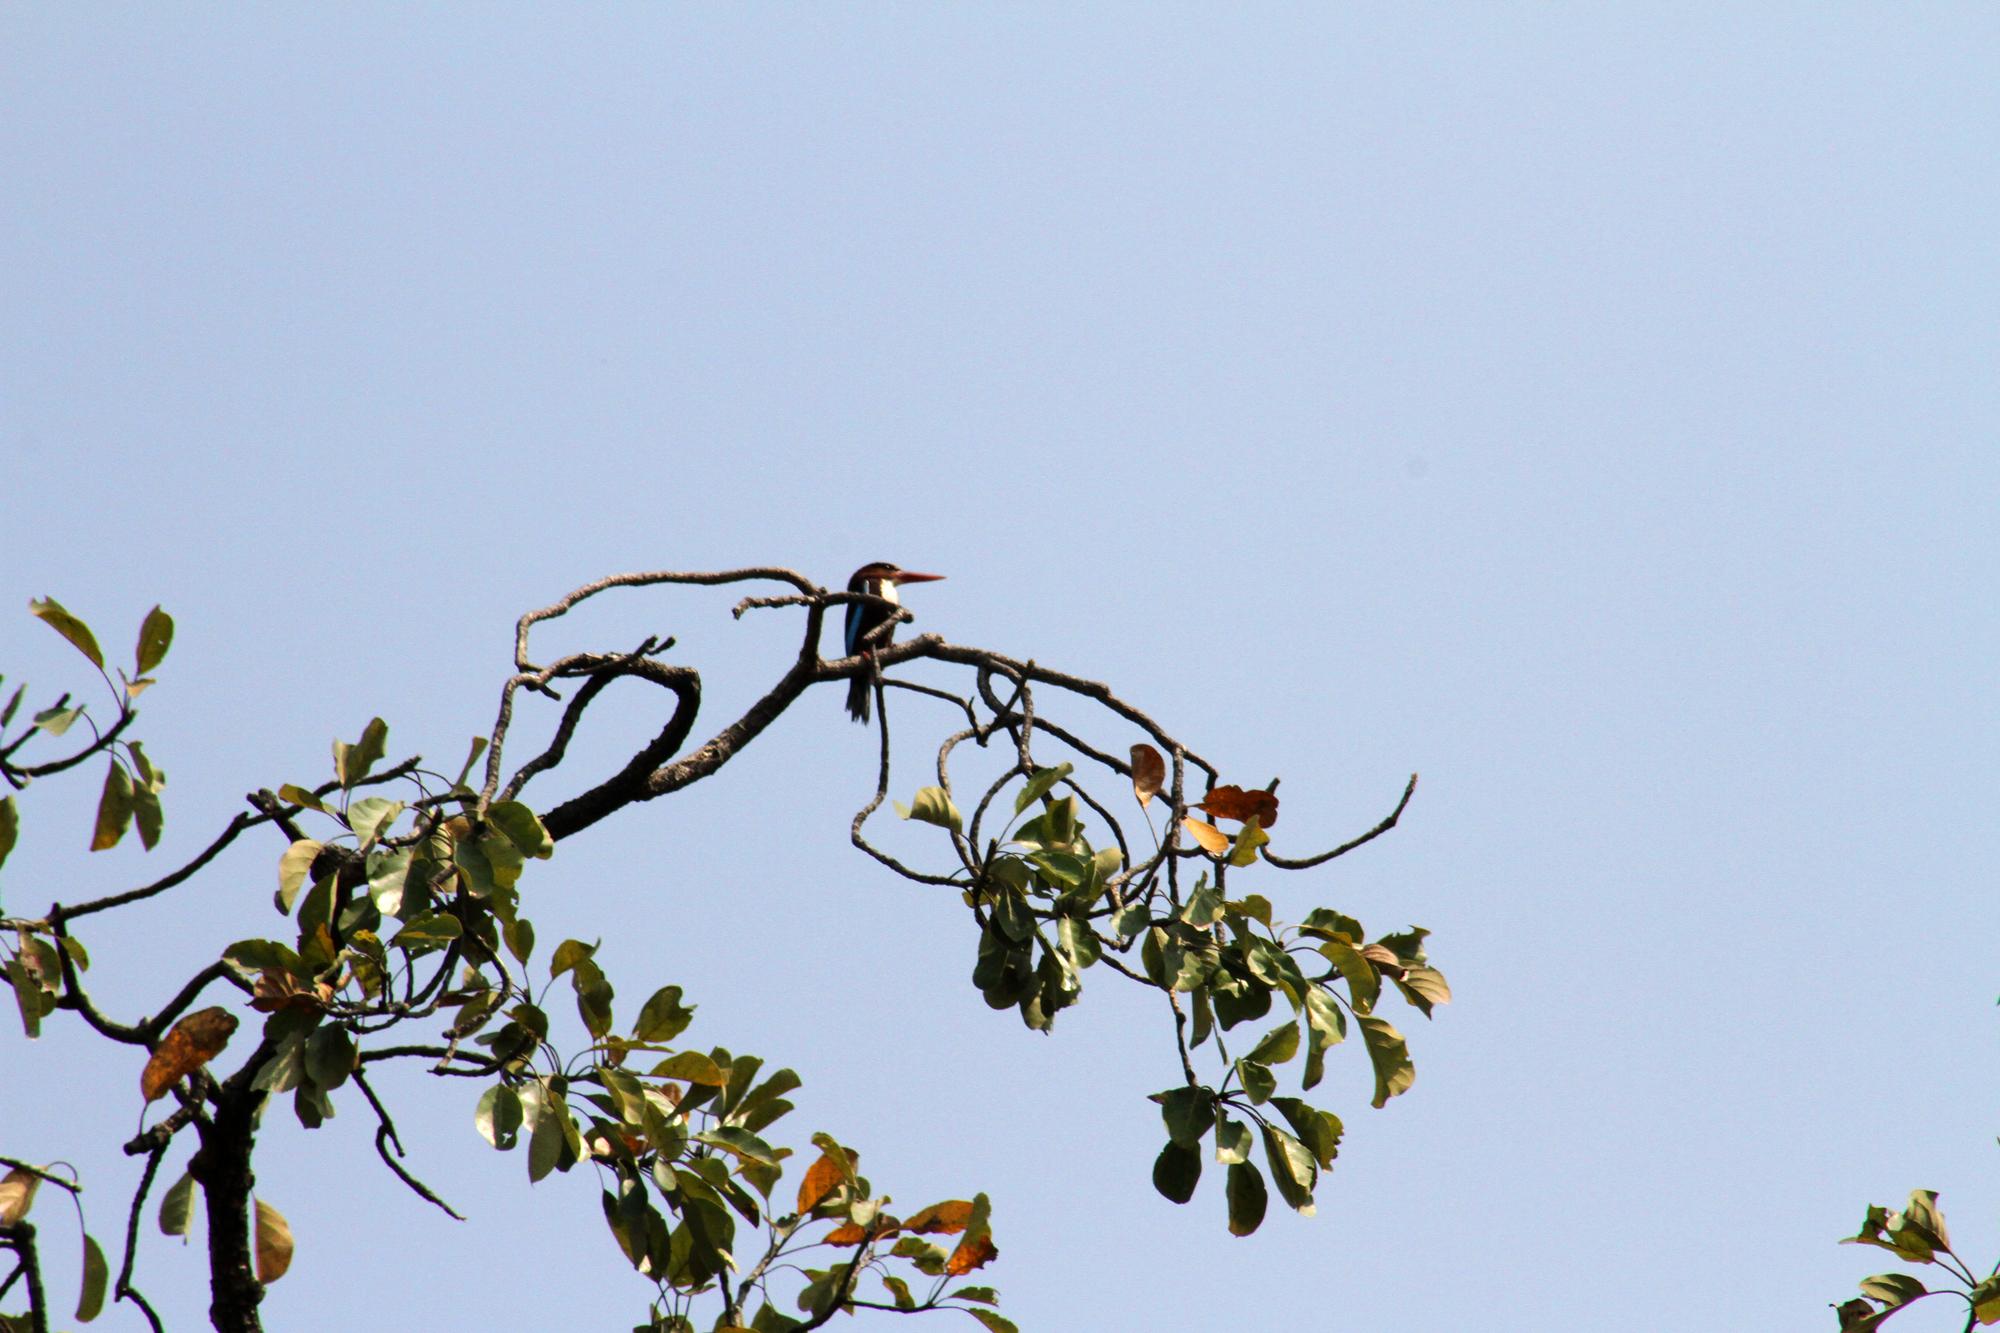 Gray Indian Kingfisher